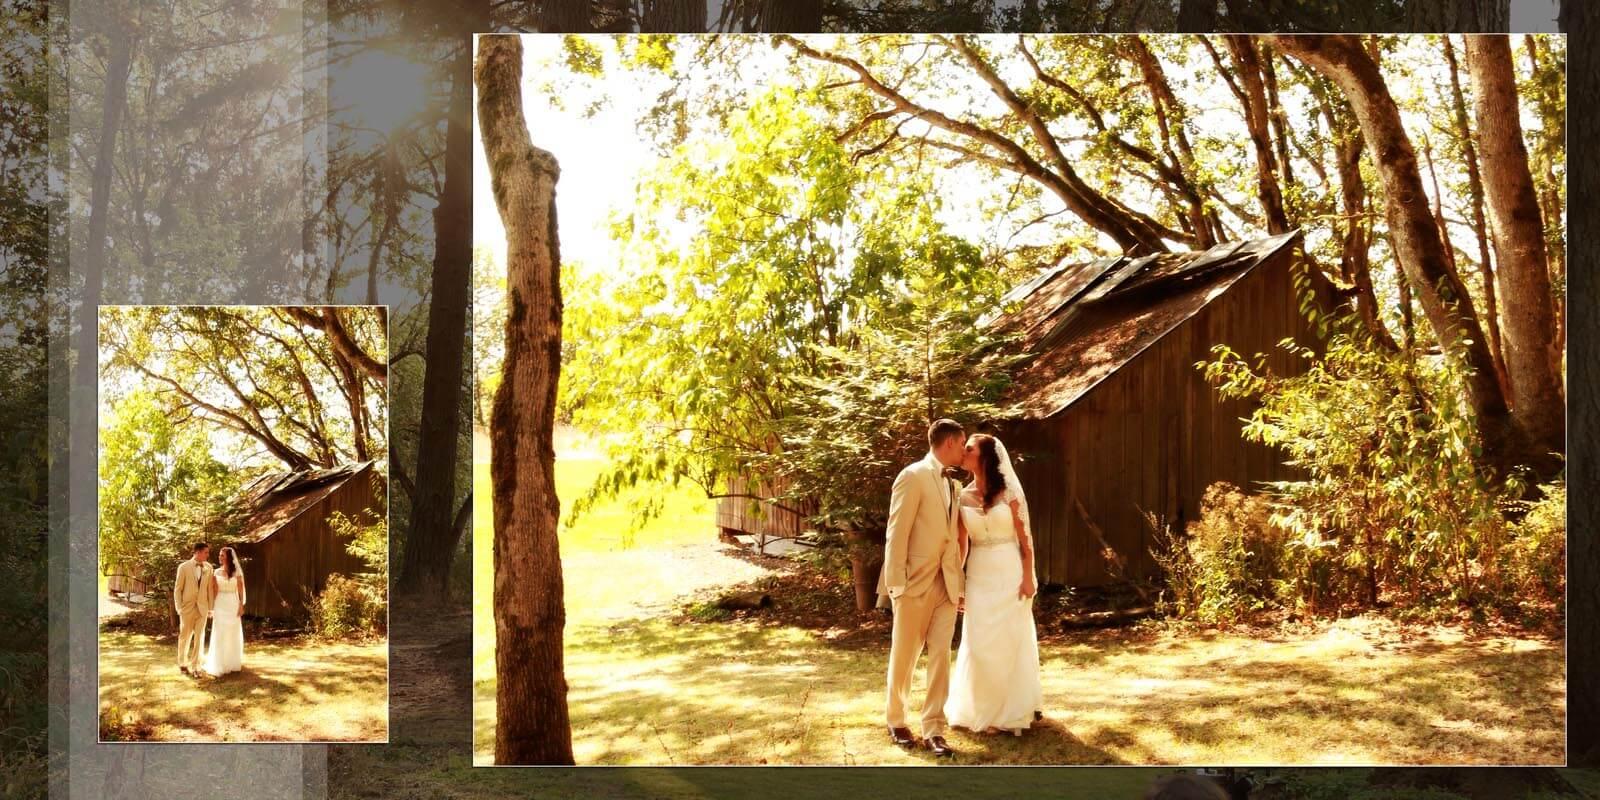 Jasper-House-Farm-Outdoor-Wedding-Lane-County-Oregon-photographers-022-023.jpg